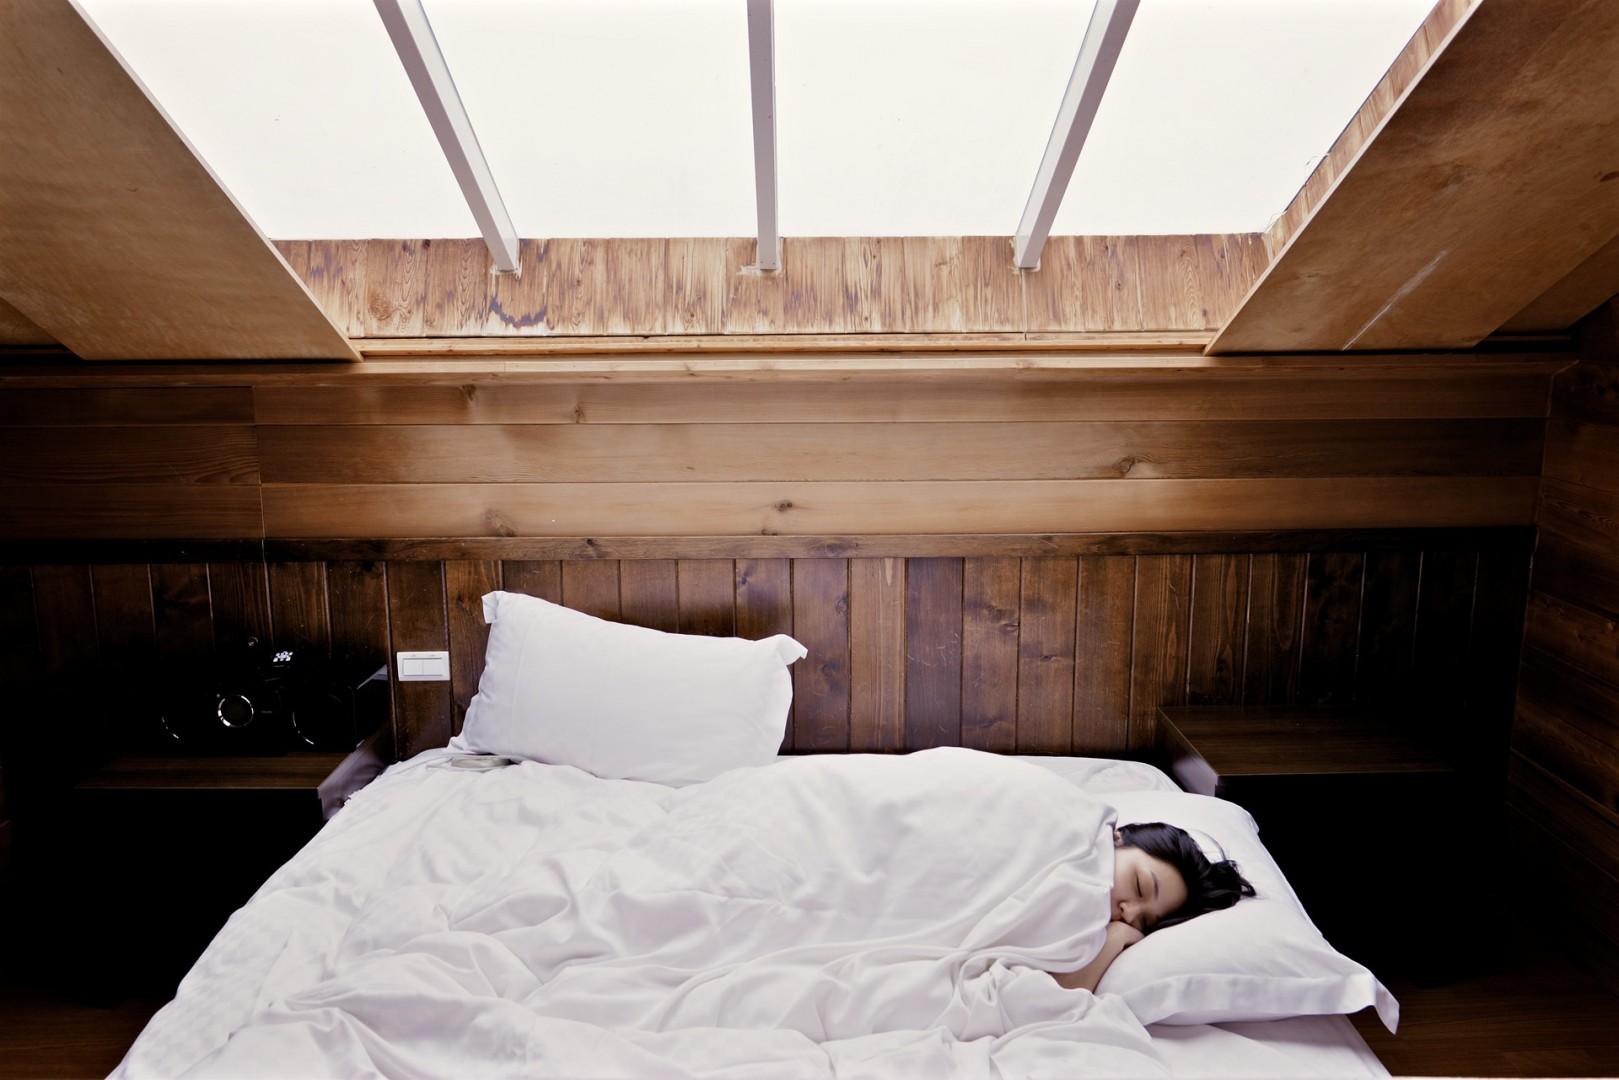 Sleep 1209288 1920(1)